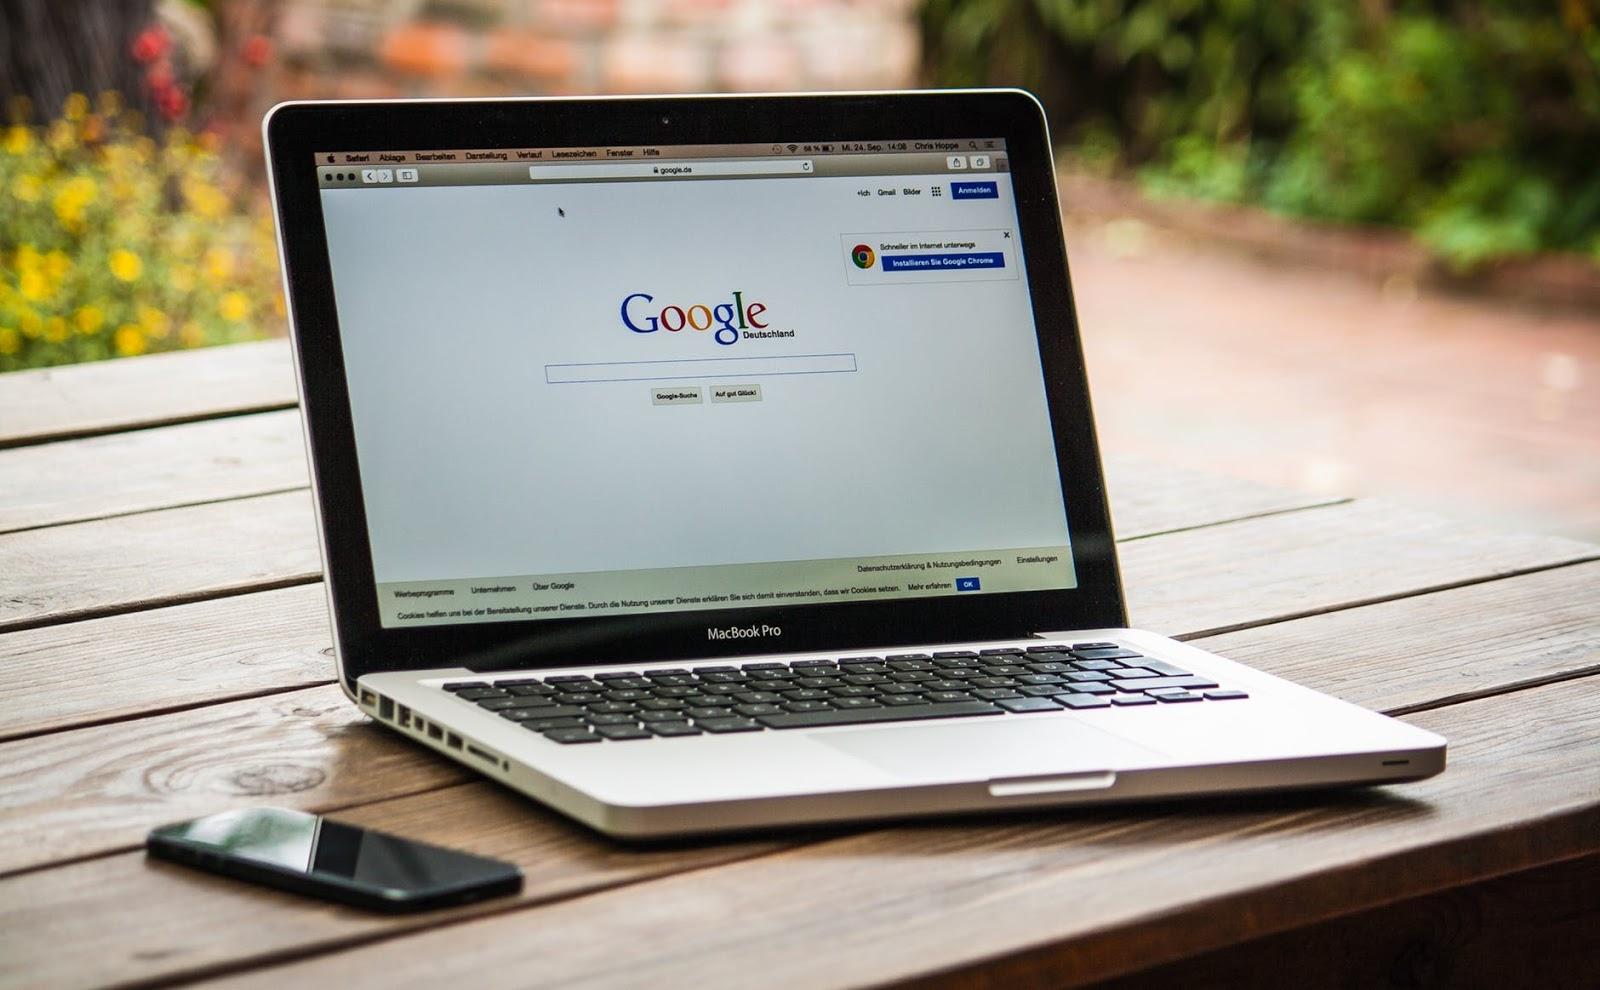 SEO Strategies that google rewards